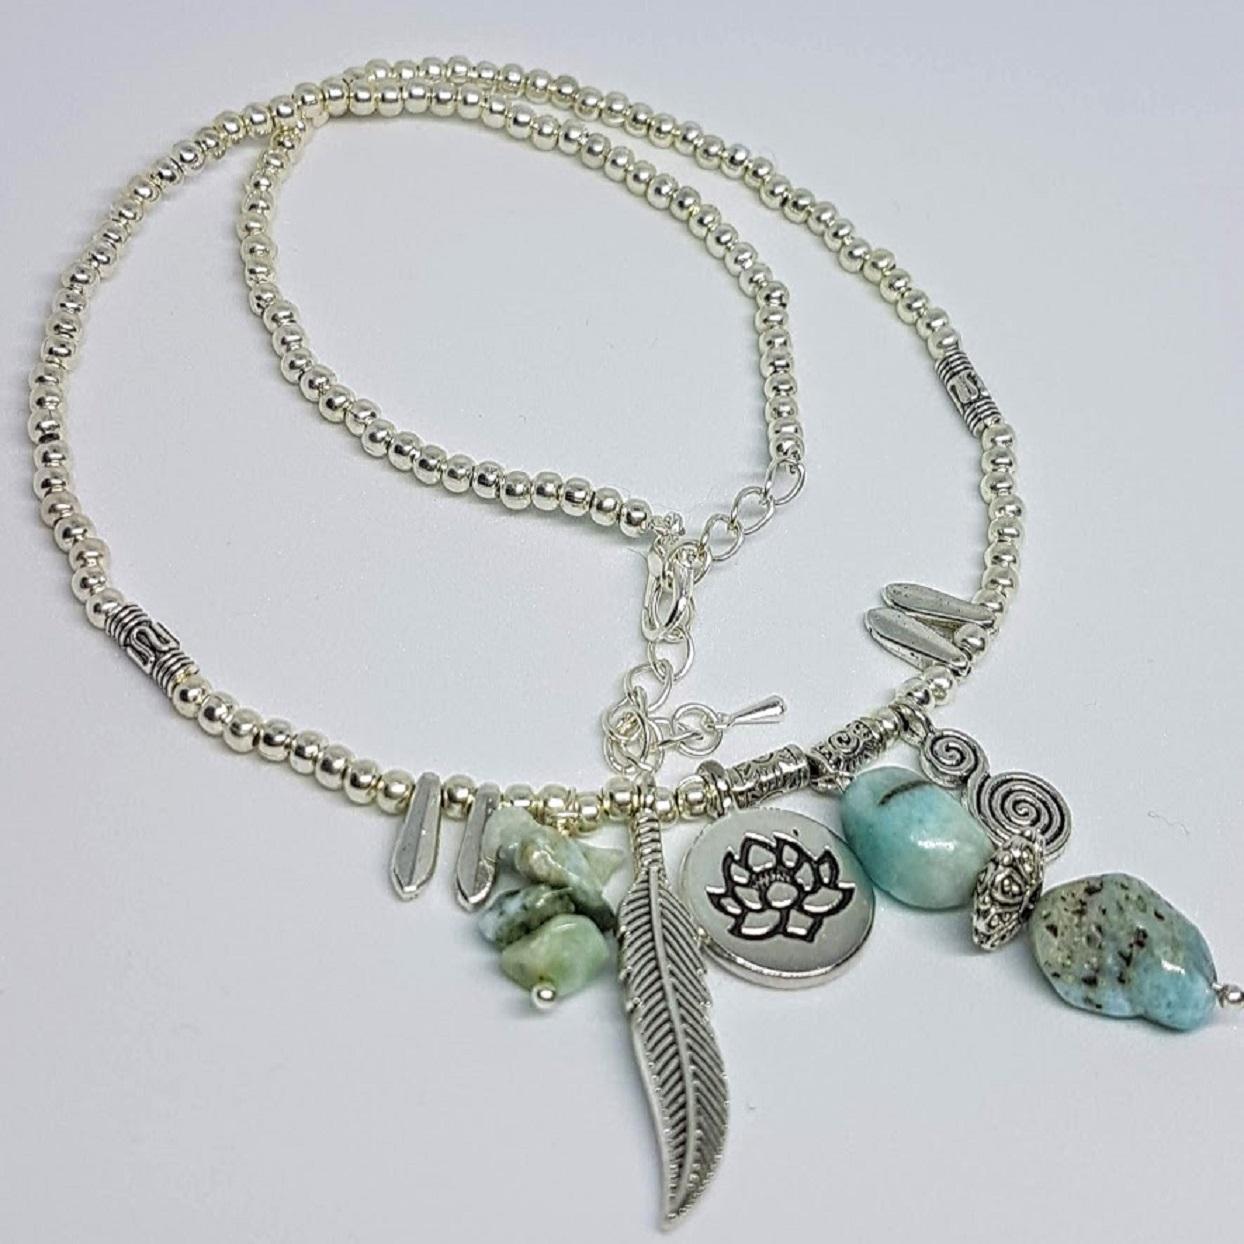 Handmade Larimar charm necklace